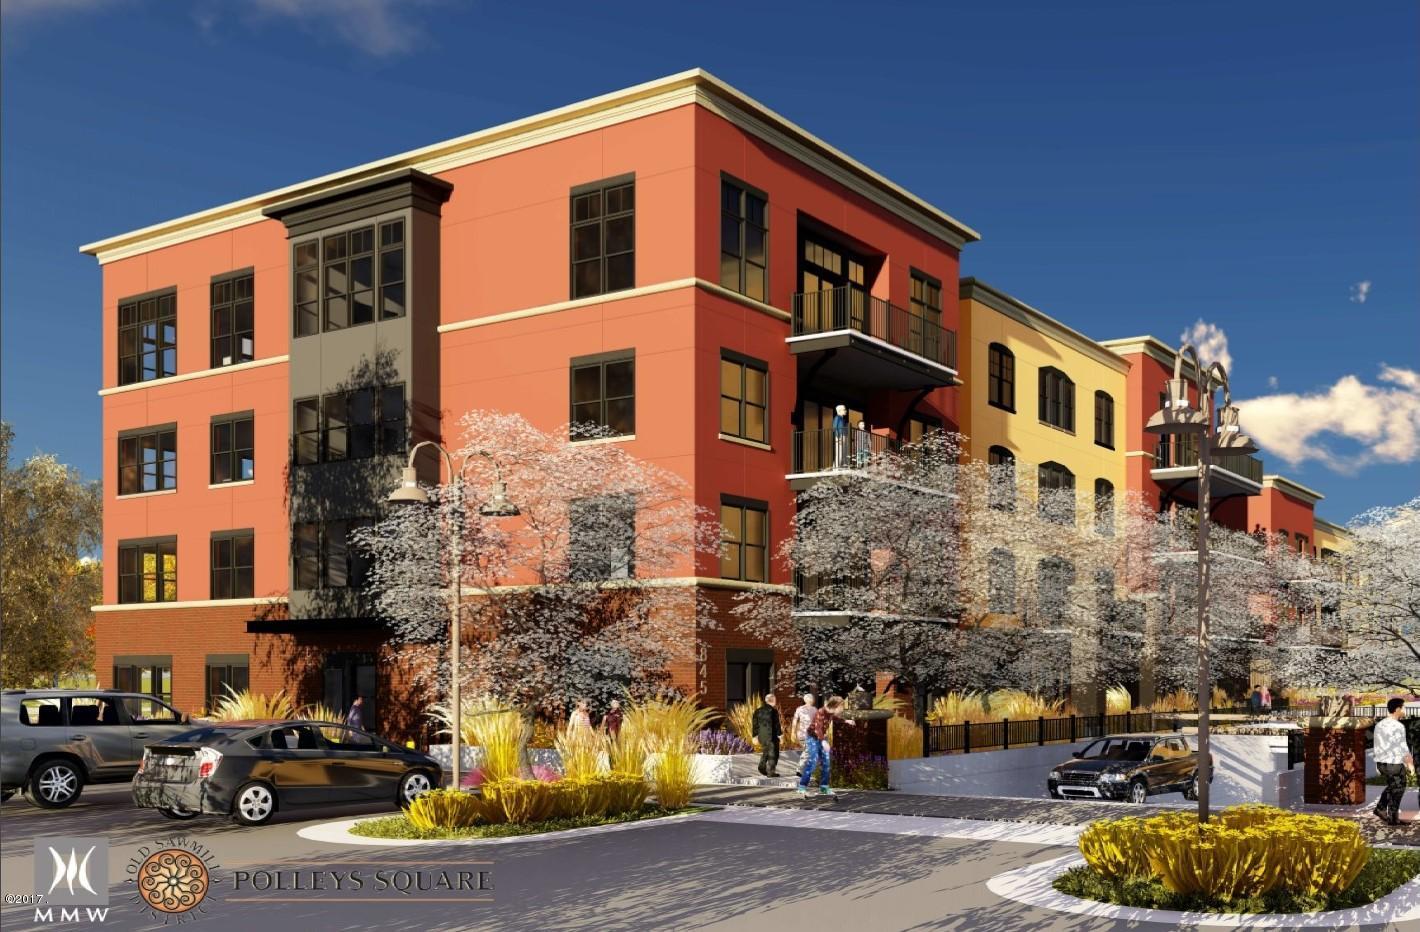 845 Wyoming Street Suite 301, Missoula, MT 59801